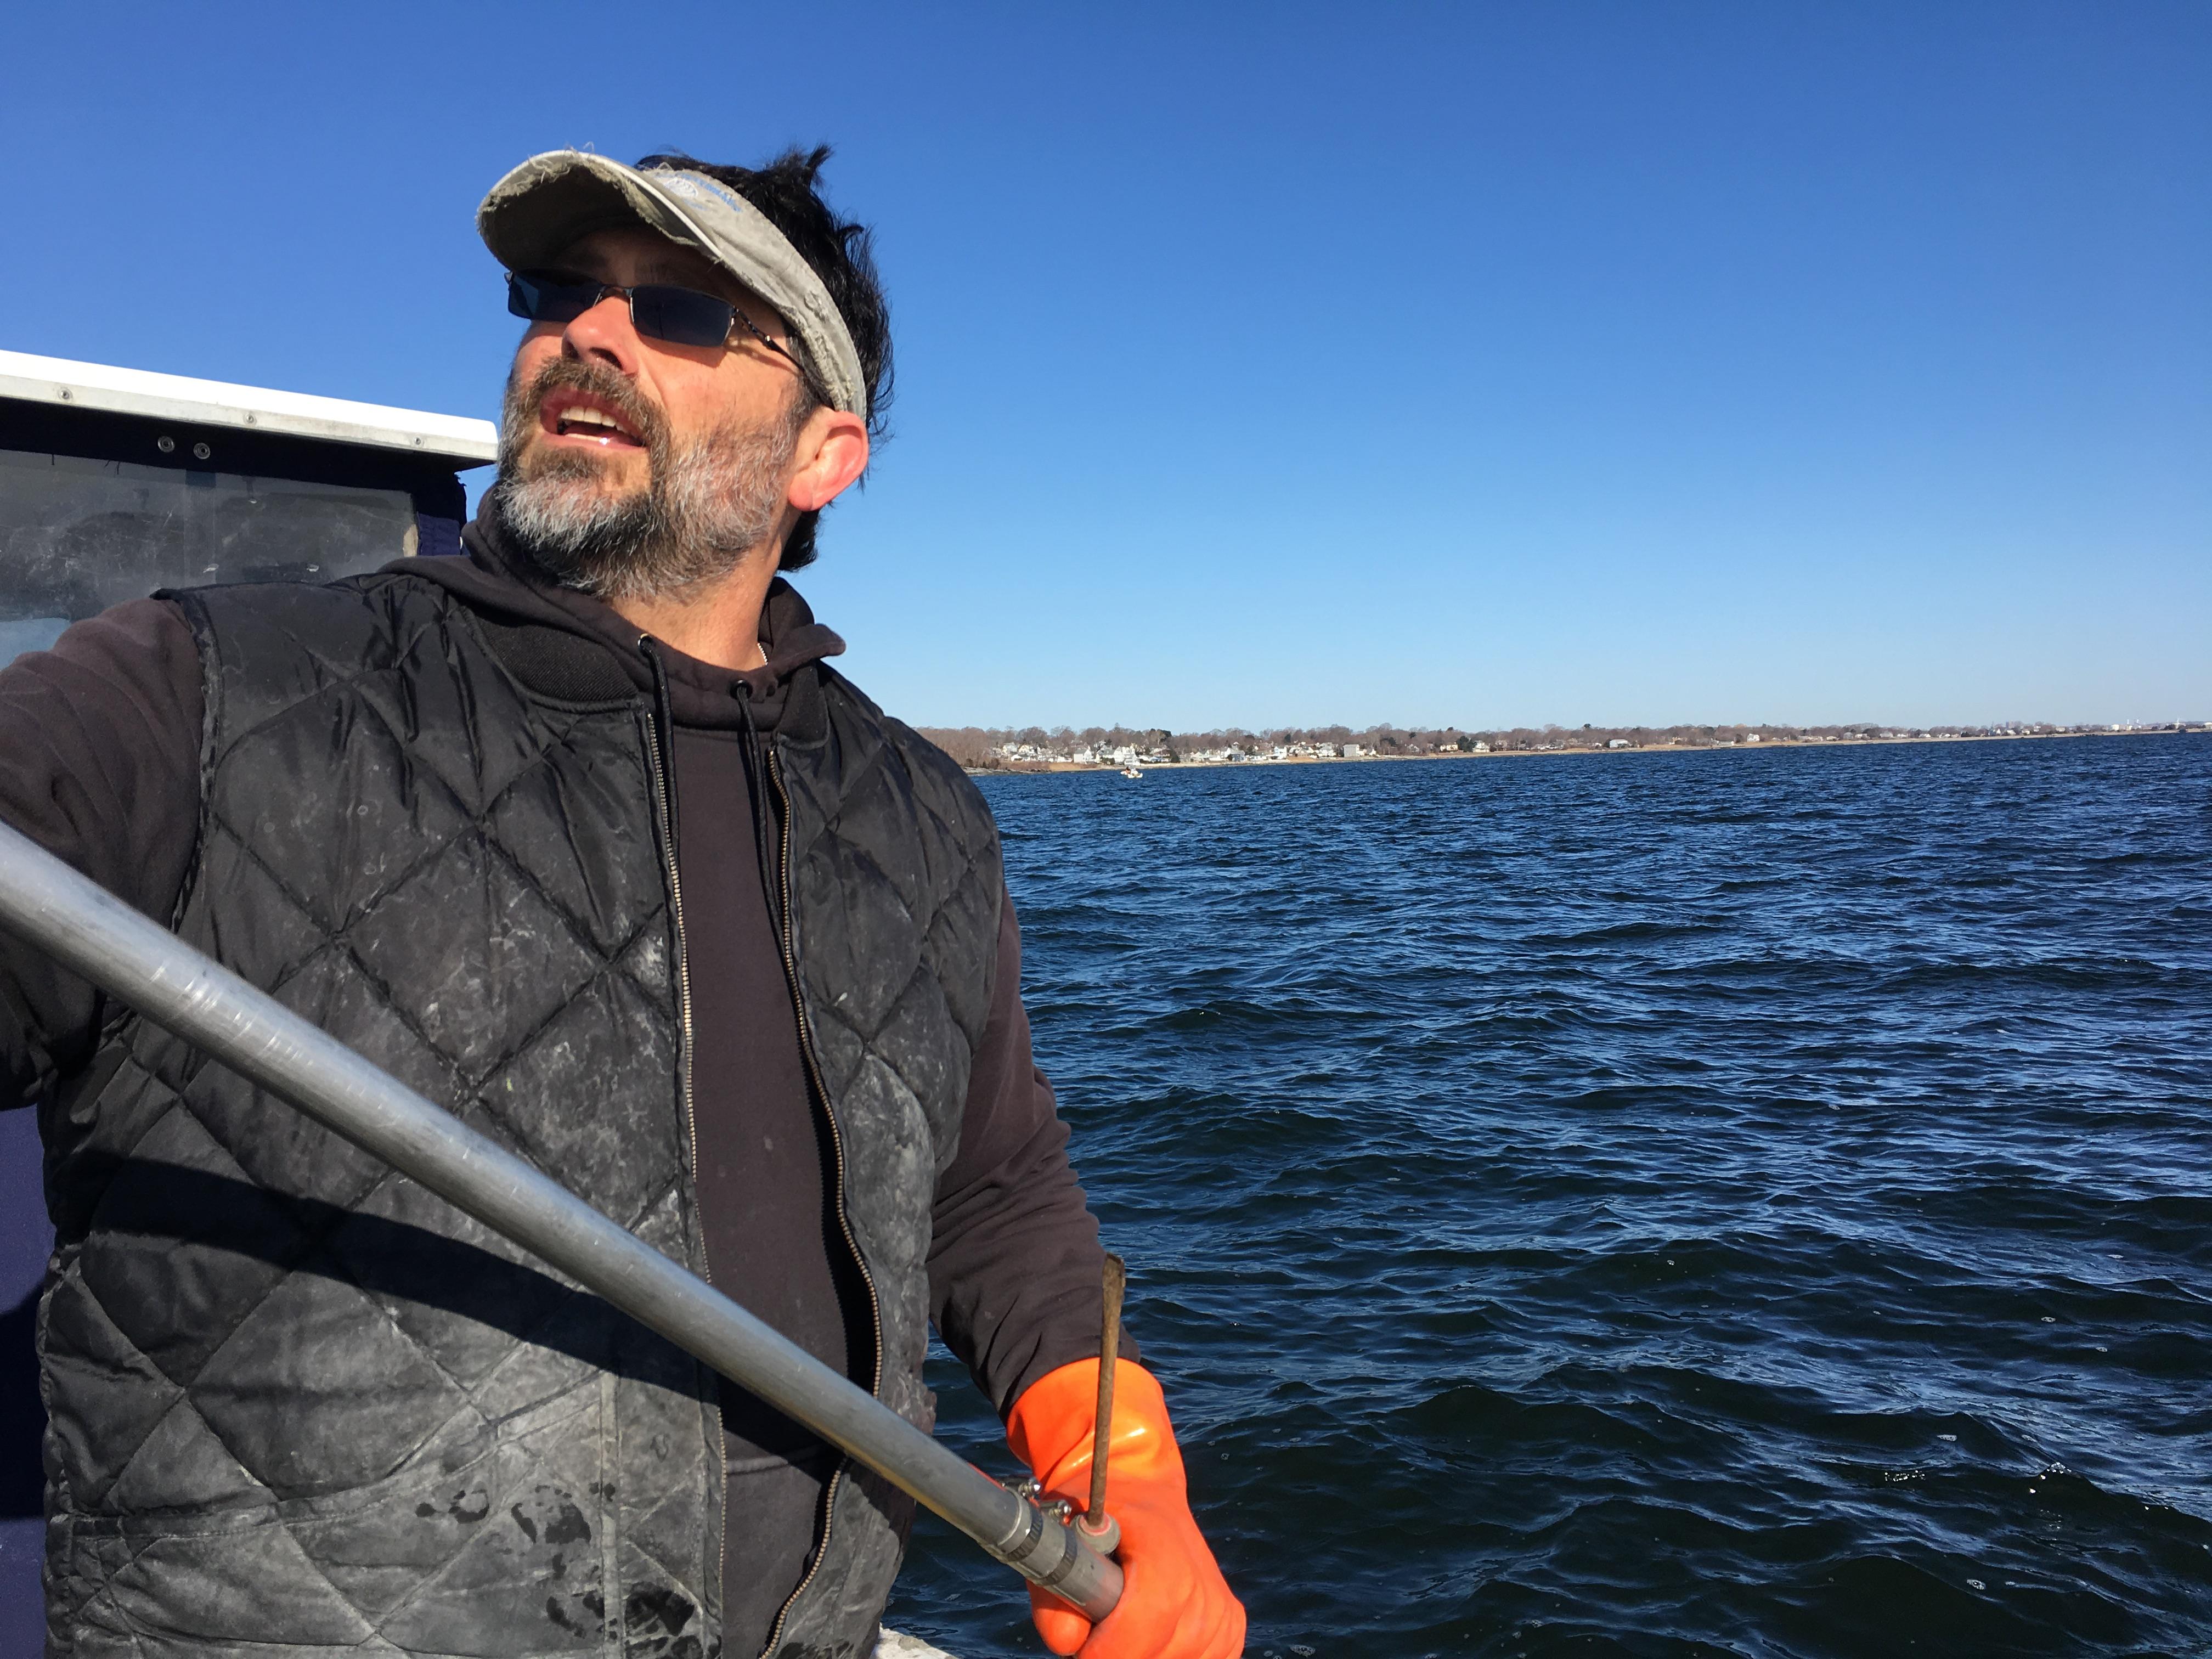 Inside Rhode Island's Quahog Industry, A Shrinking Workforce